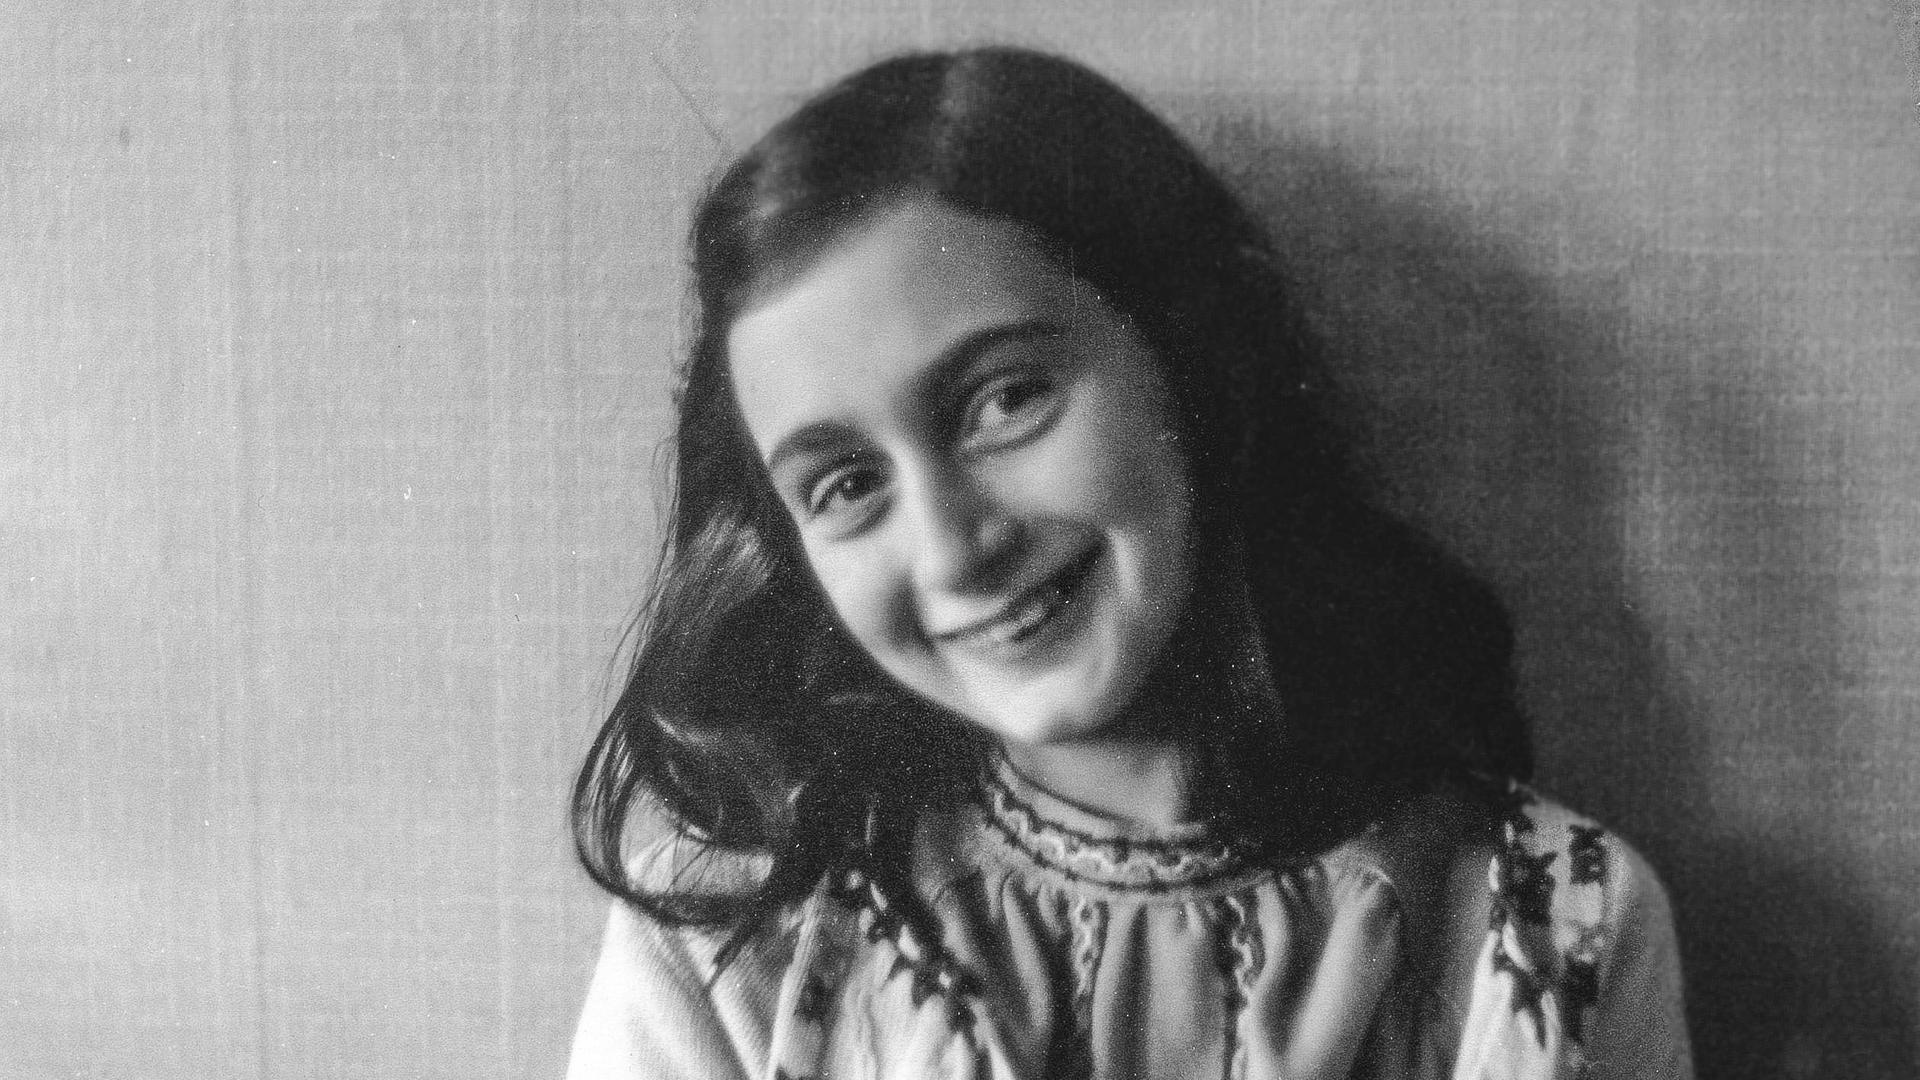 anne frank - Anne Frank Lebenslauf